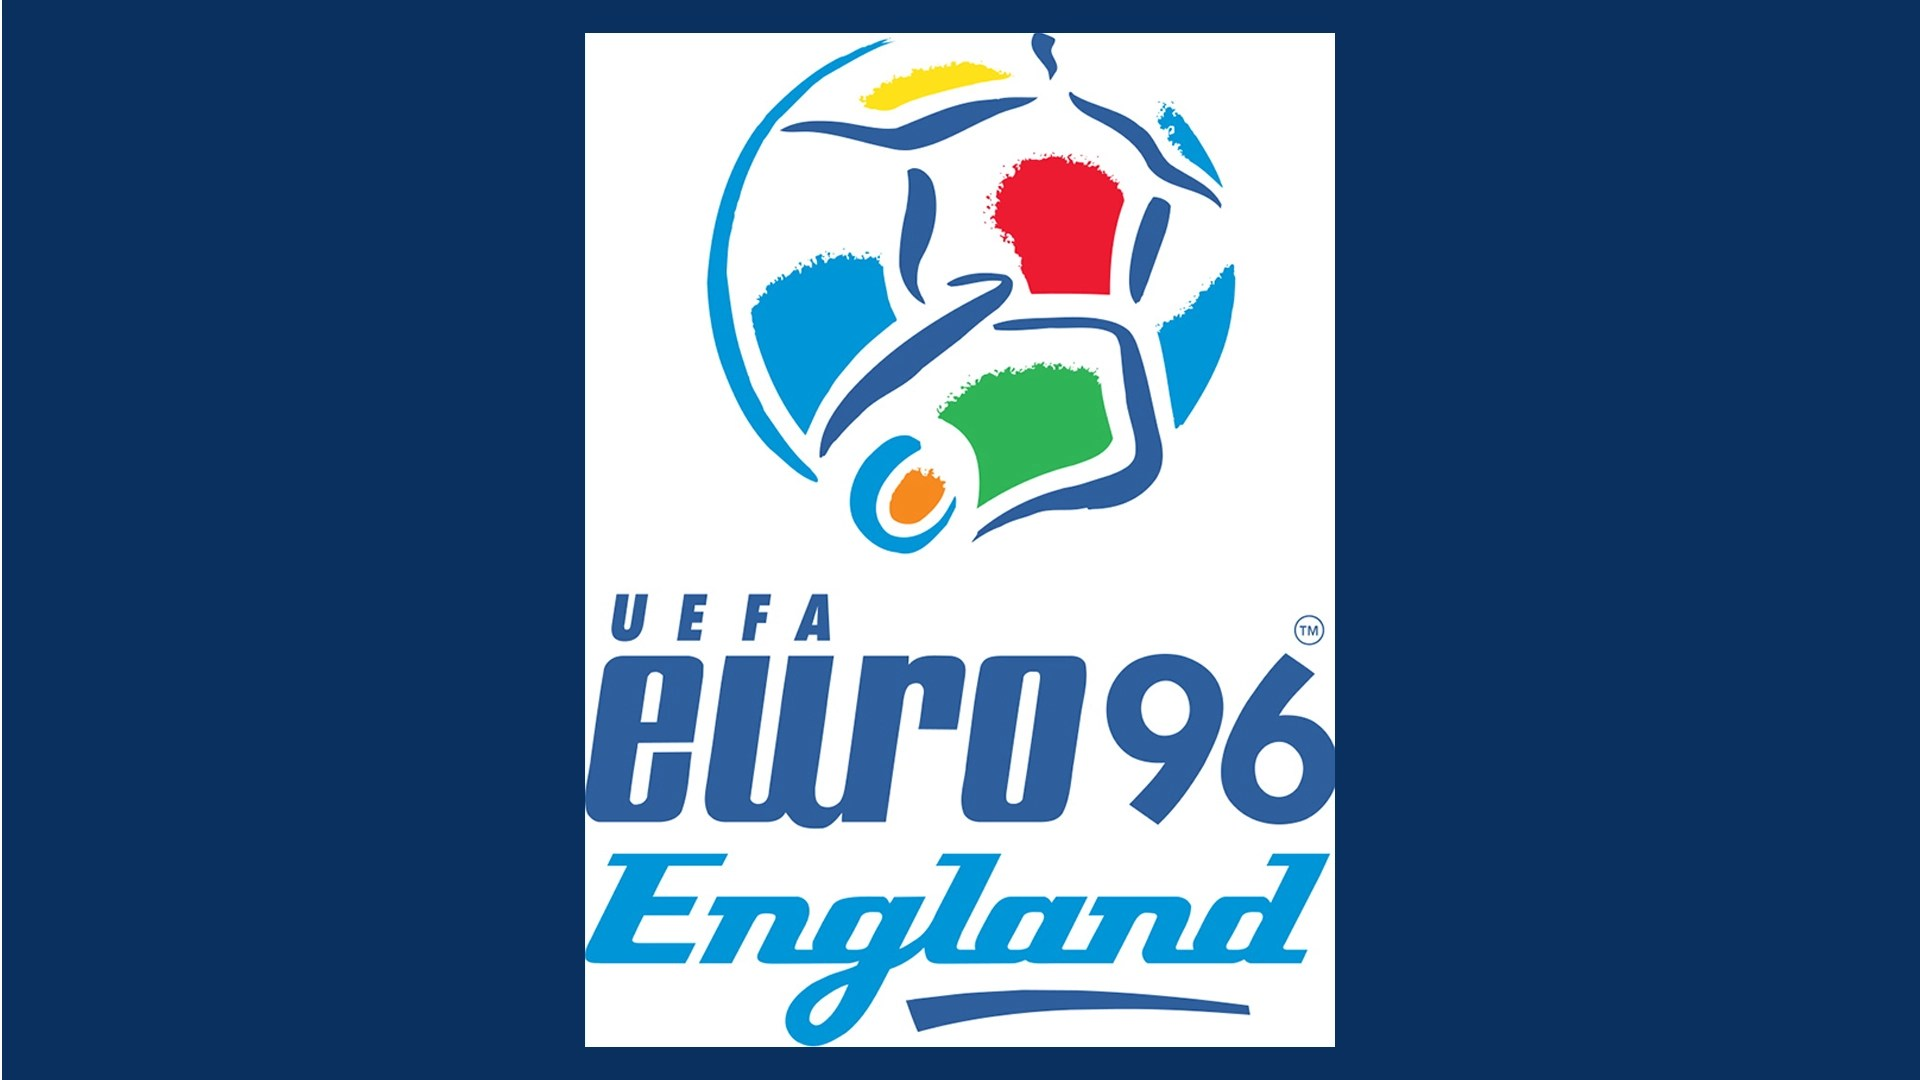 SPORT - Inghilterra Euro '96